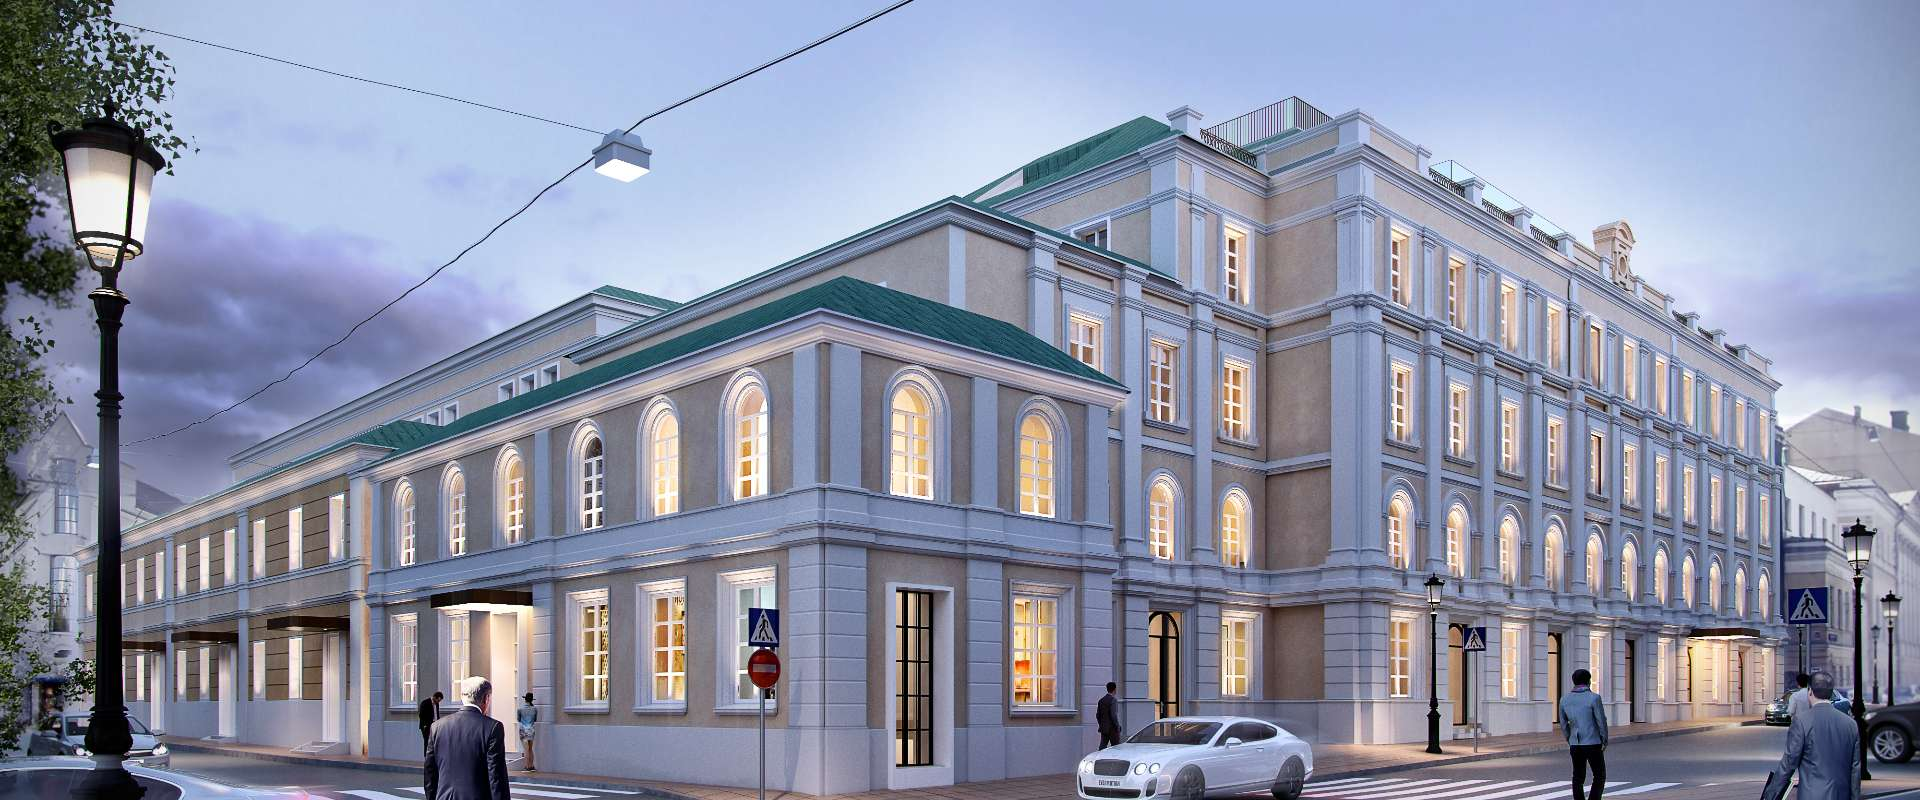 Bvlgari Hotel & Residences Moscow 2021